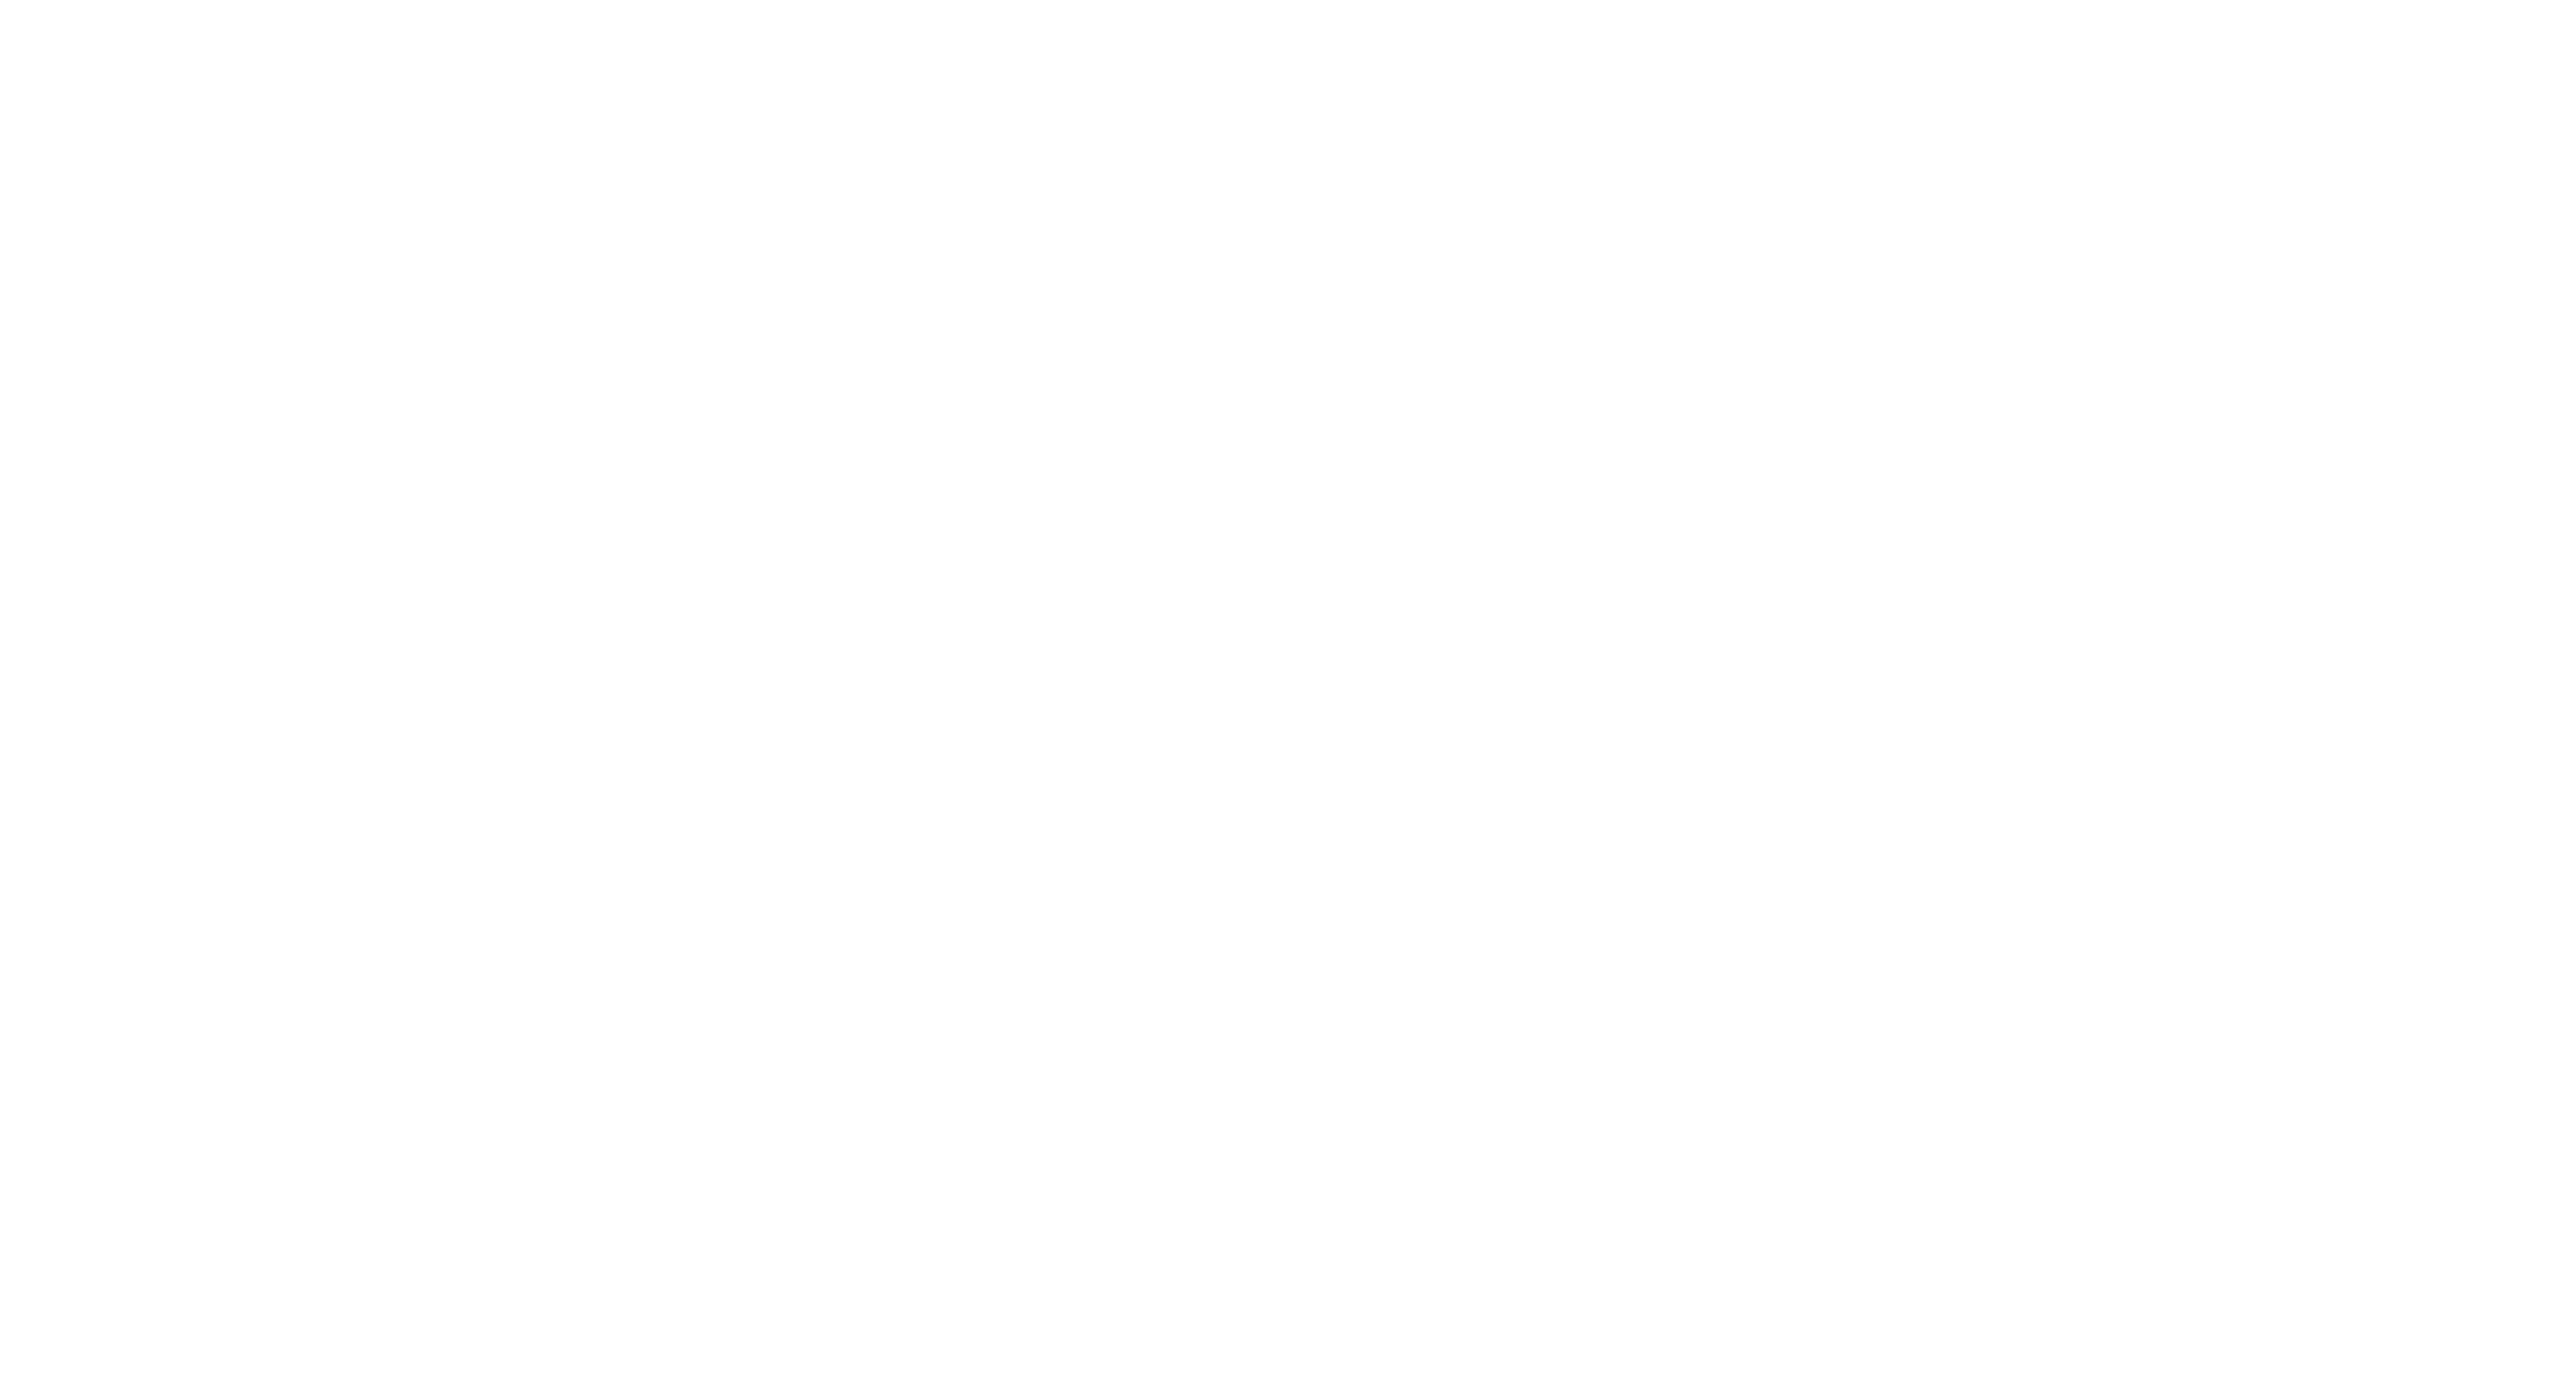 MADTRAIL